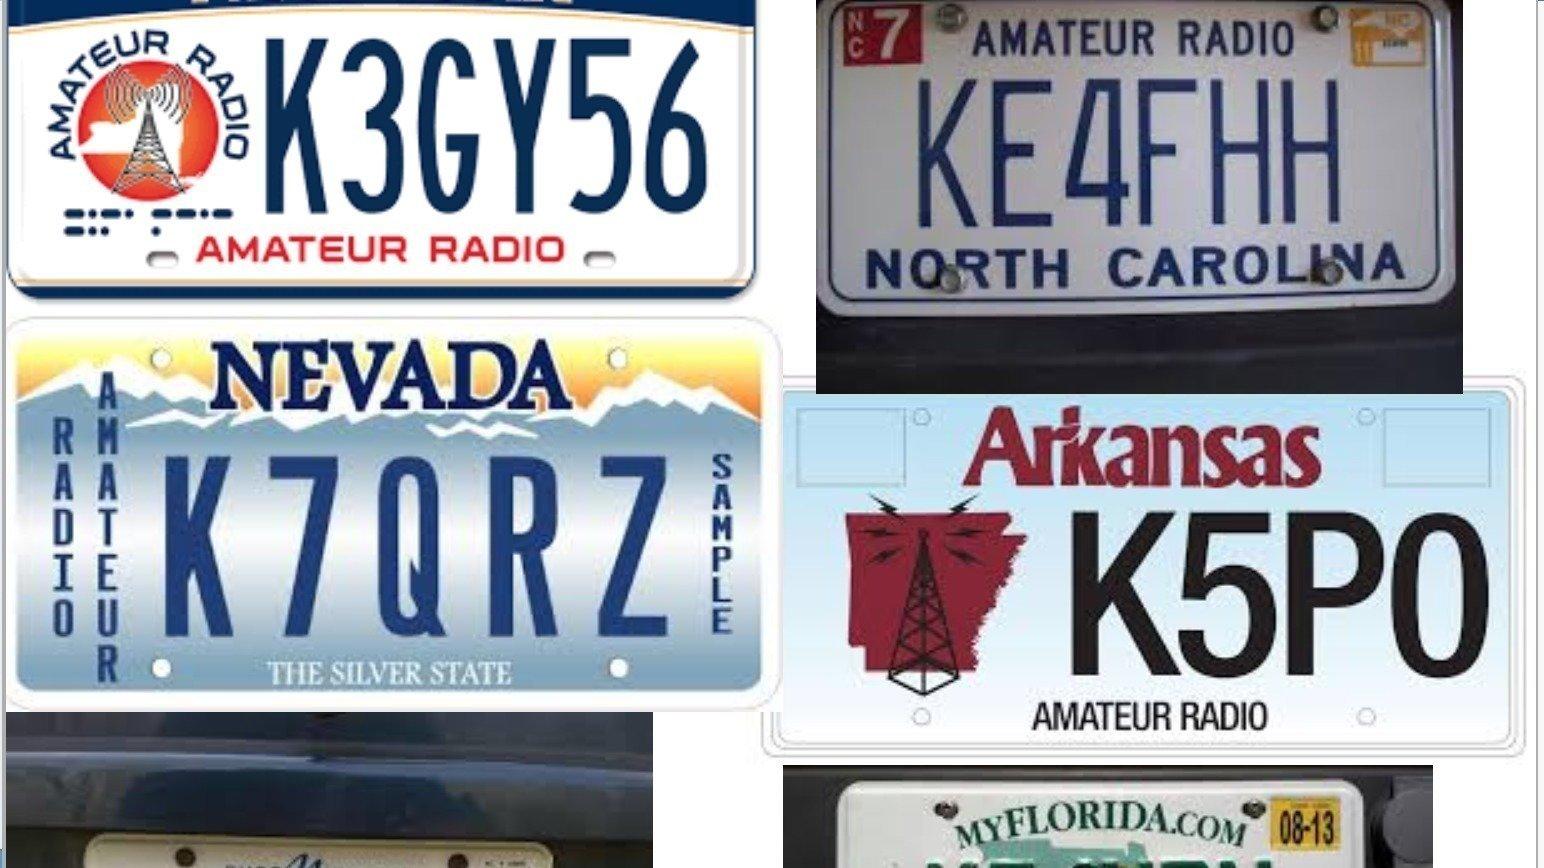 Customized License Plates >> Petition · California Amateur Radio License Plates · Change.org